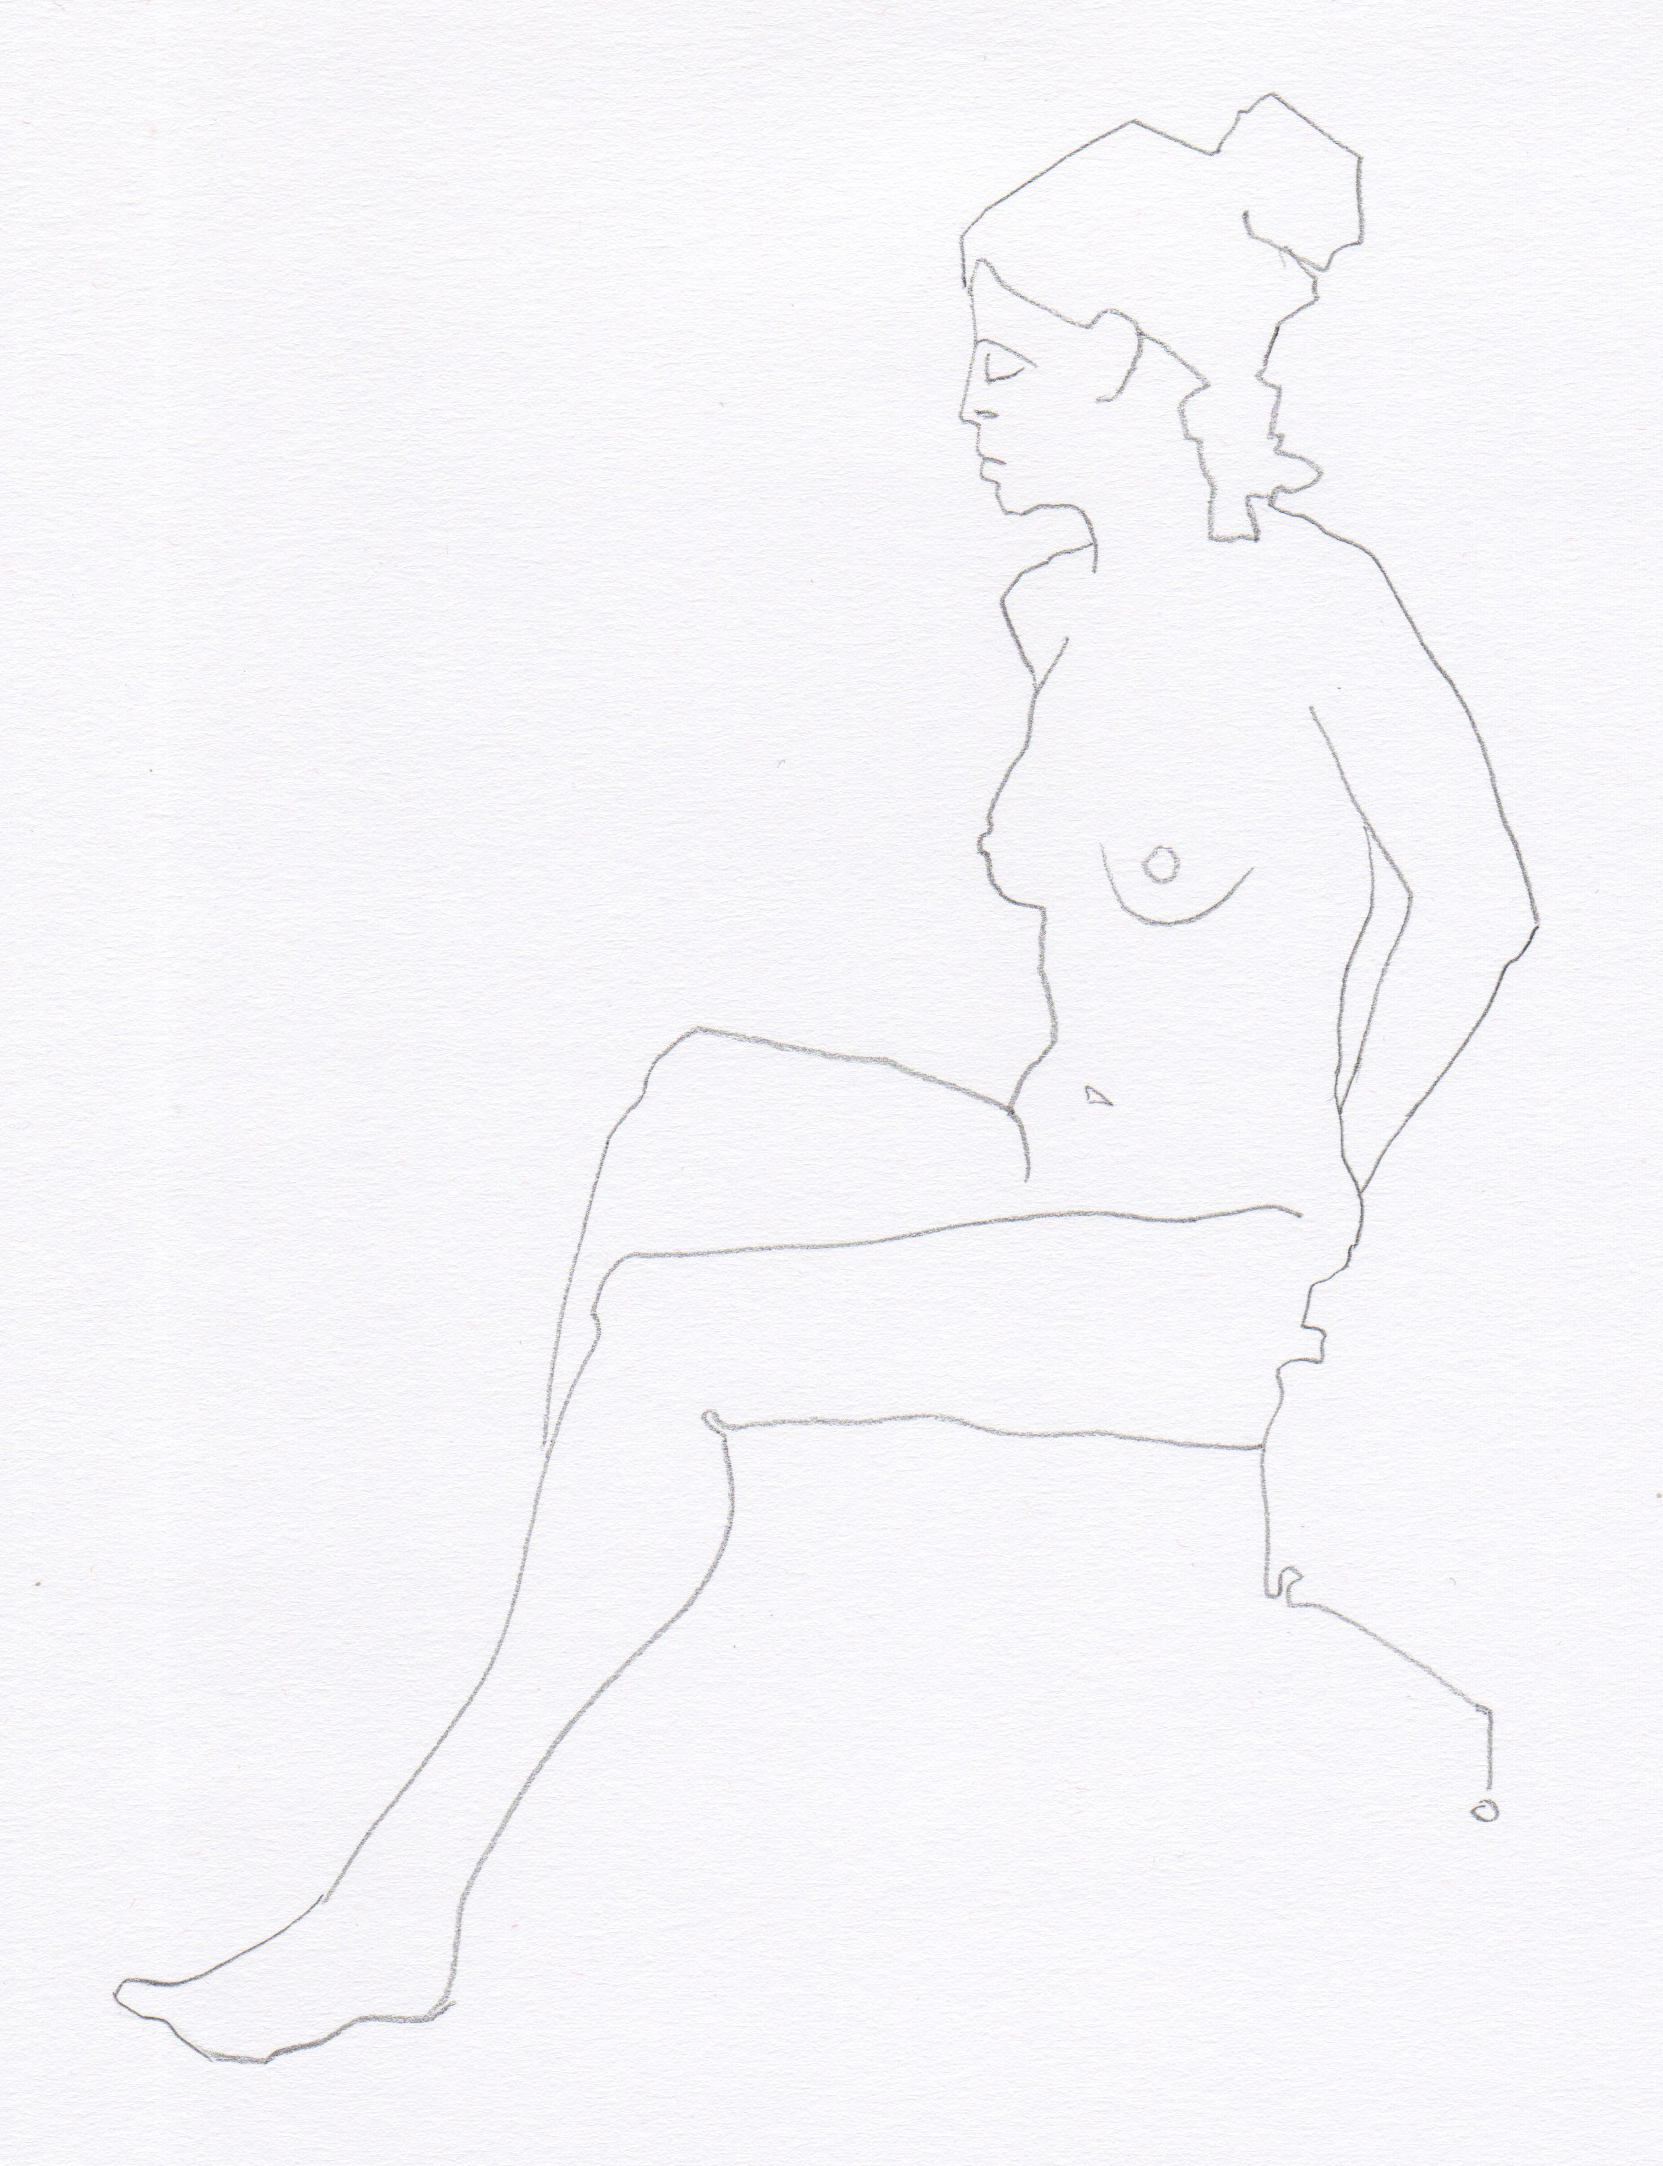 2012_Sketch_F-Beudin_013